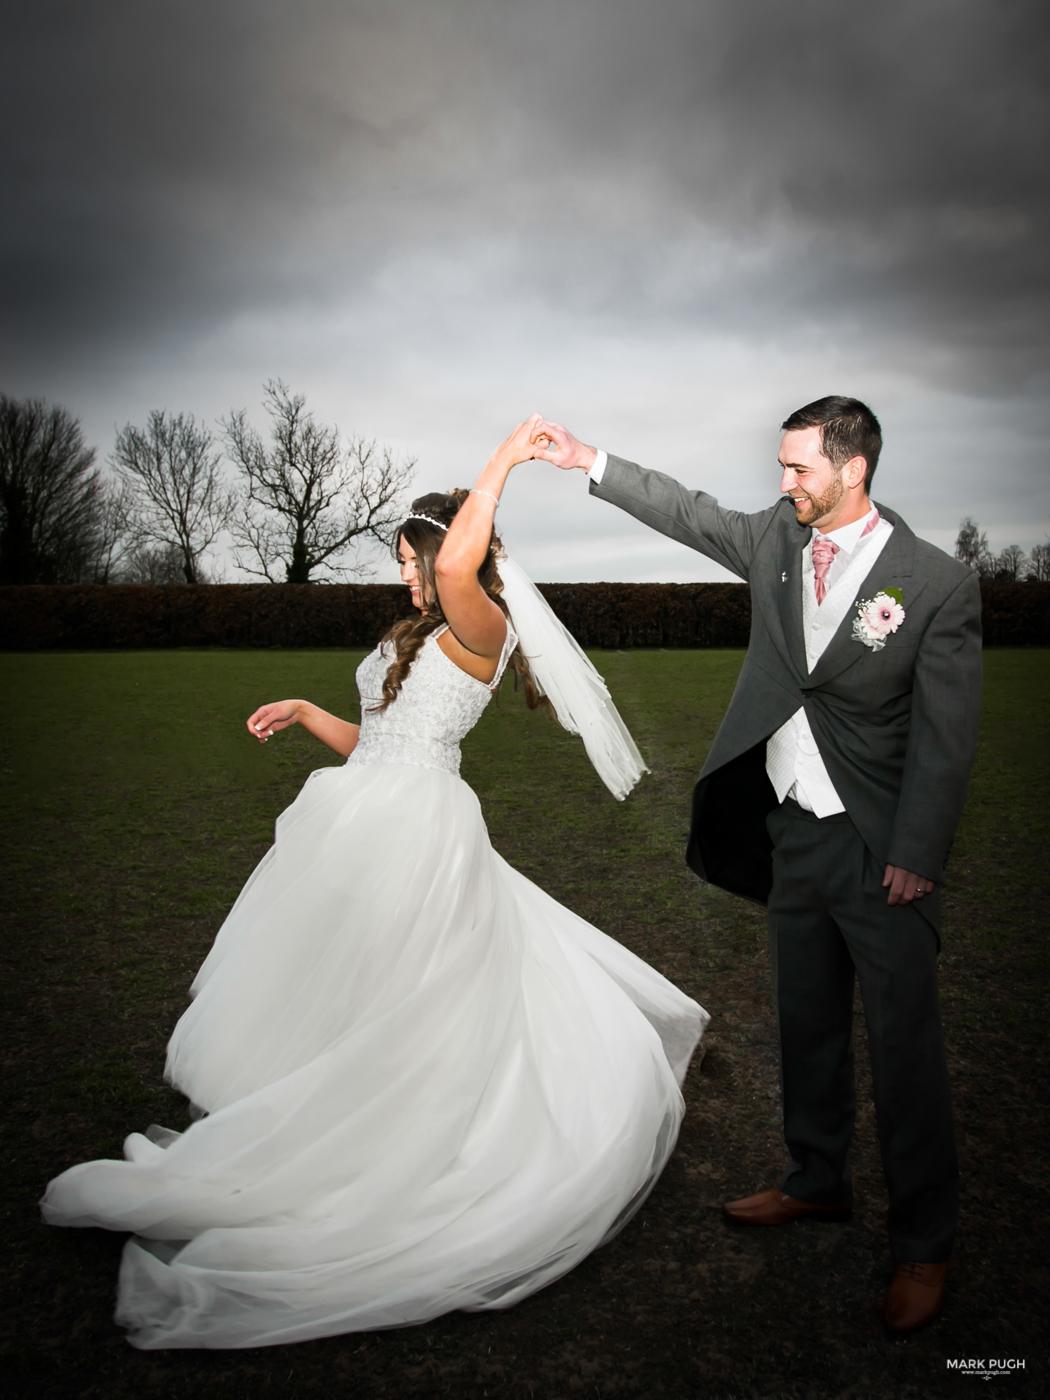 013 Wedding Photography Award winning Wedding Photographer and Videographer Mark Pugh www.markpugh.com.JPG